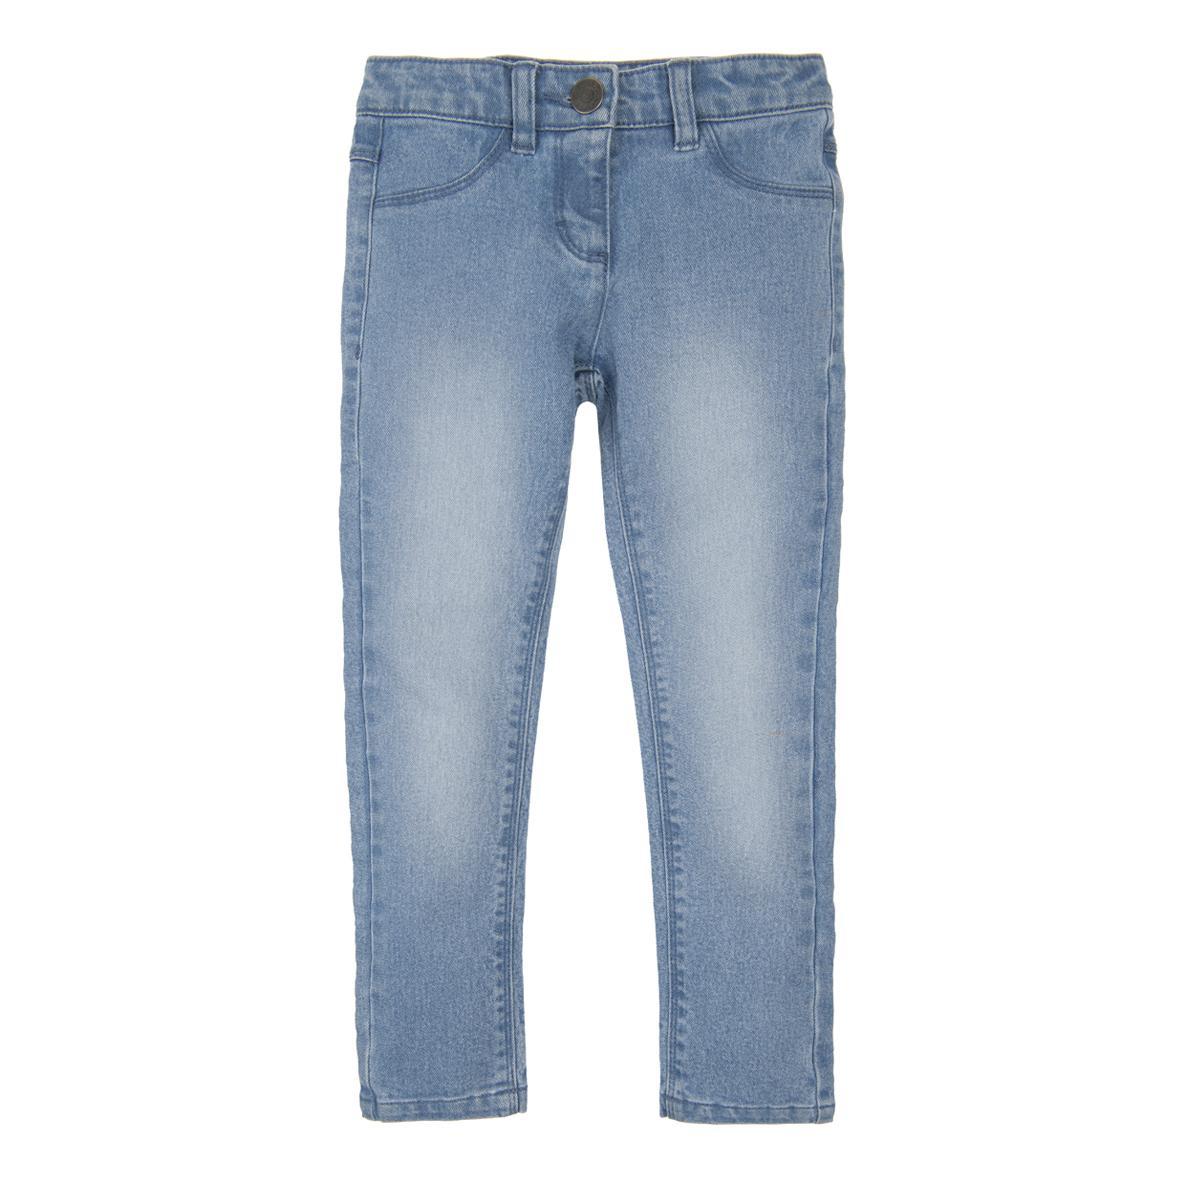 COOL CLUB Jeans